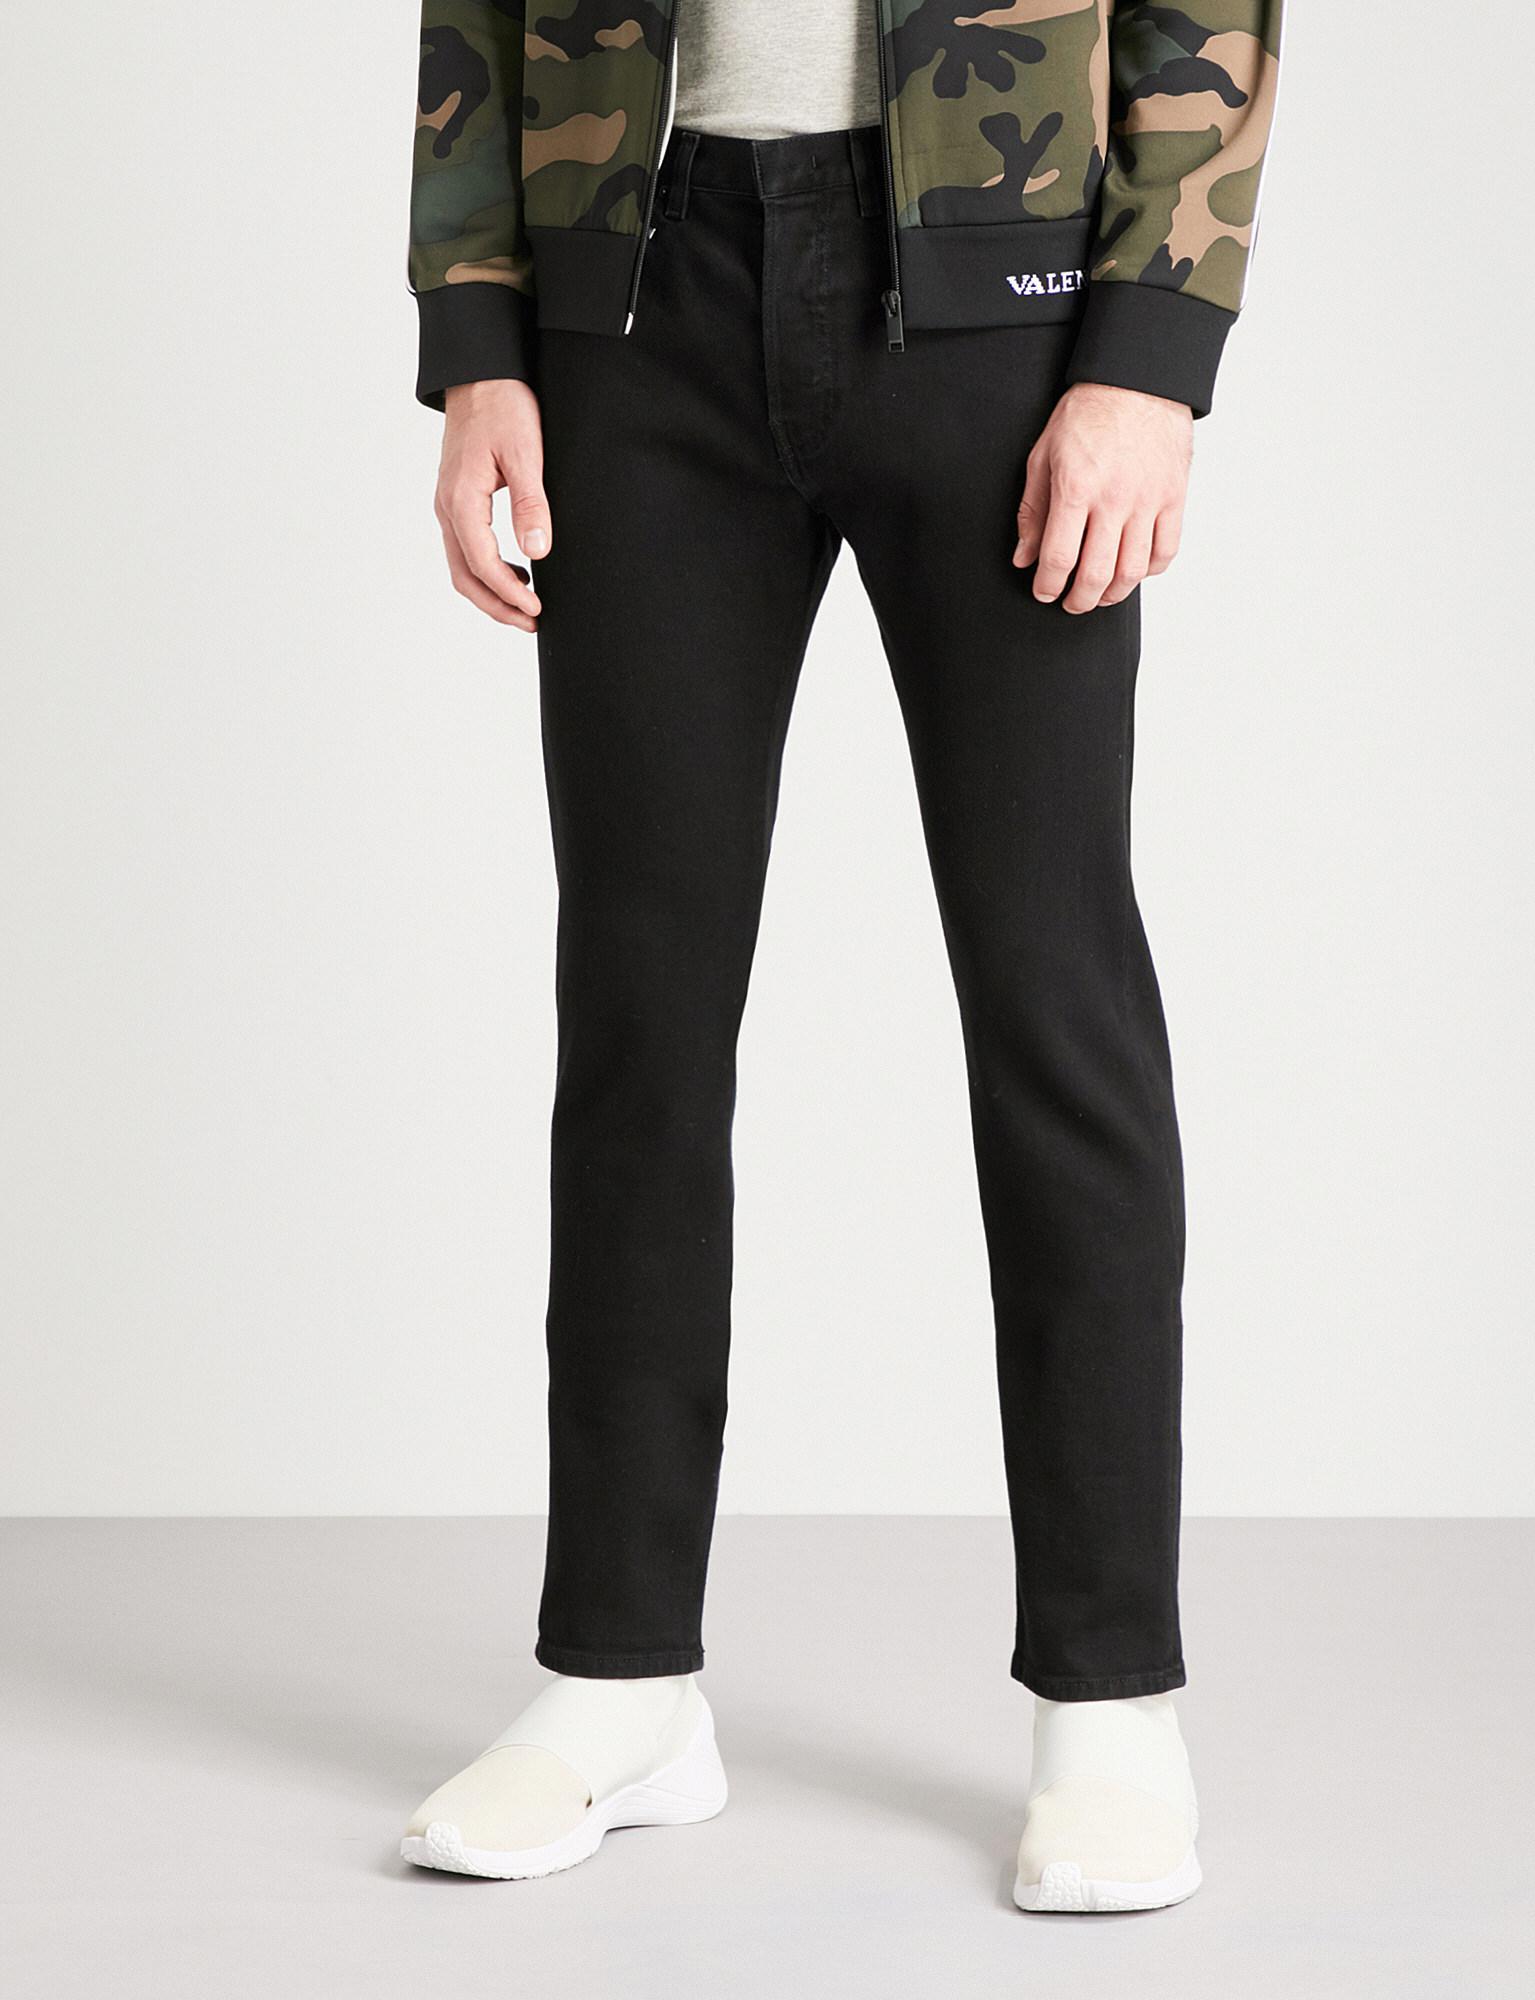 slim-fit Rockstud jeans - Black Valentino 5hmfG